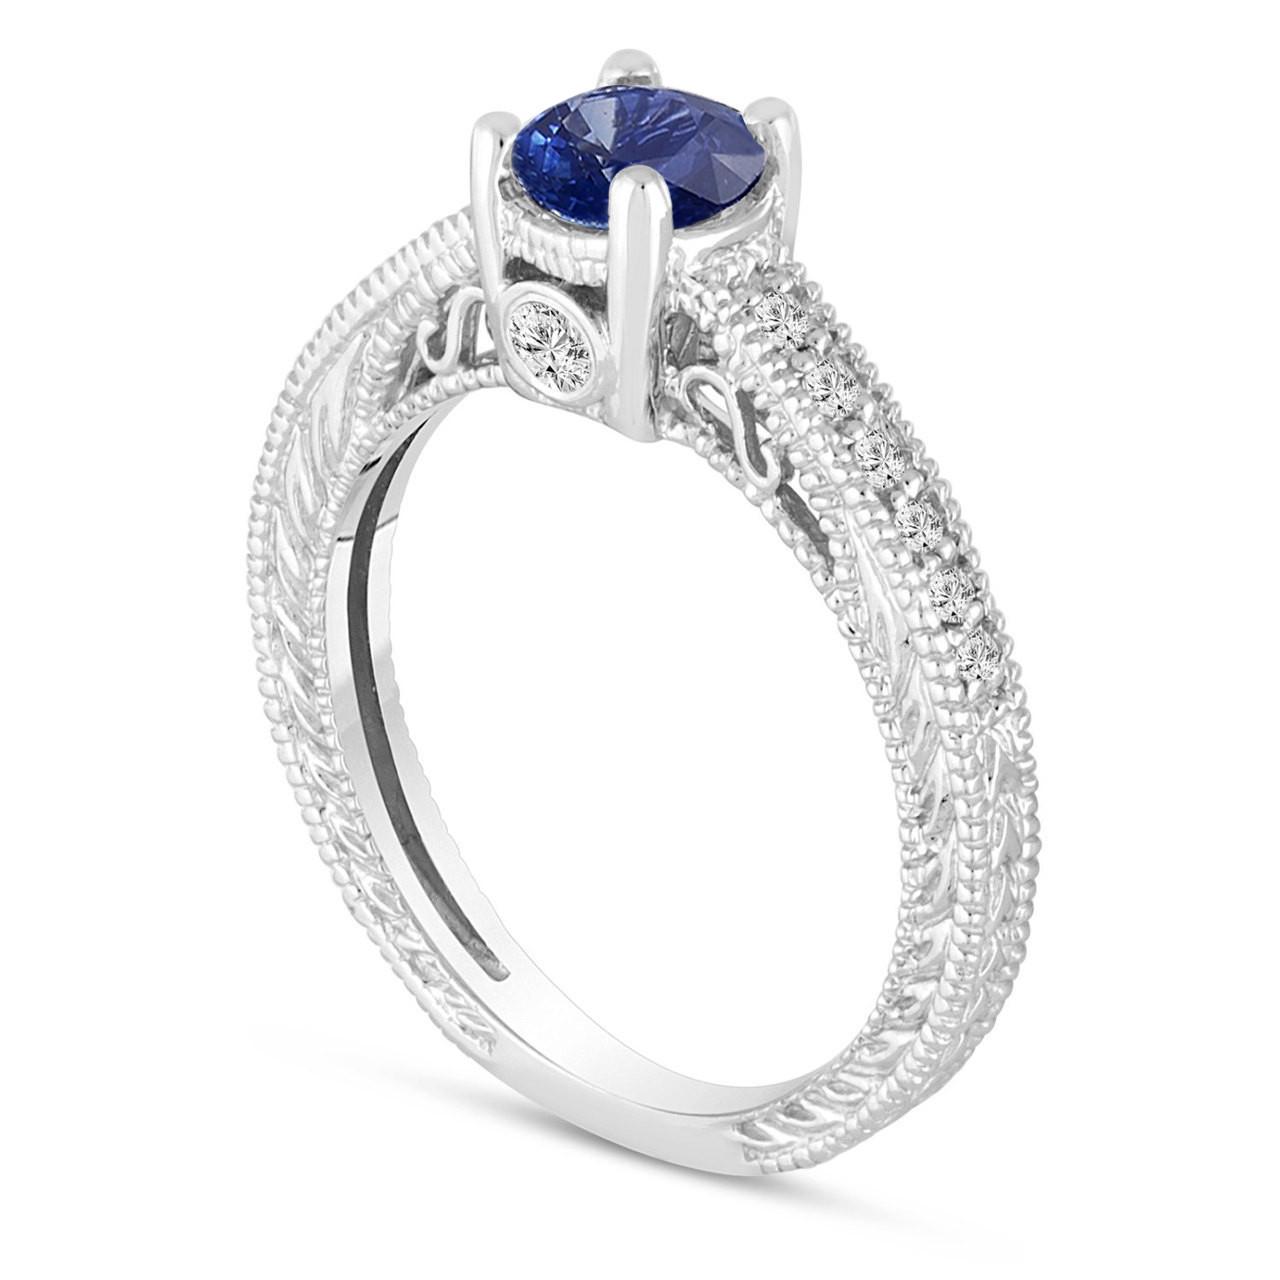 Platinum Sapphire Engagement Ring, With Diamonds Wedding